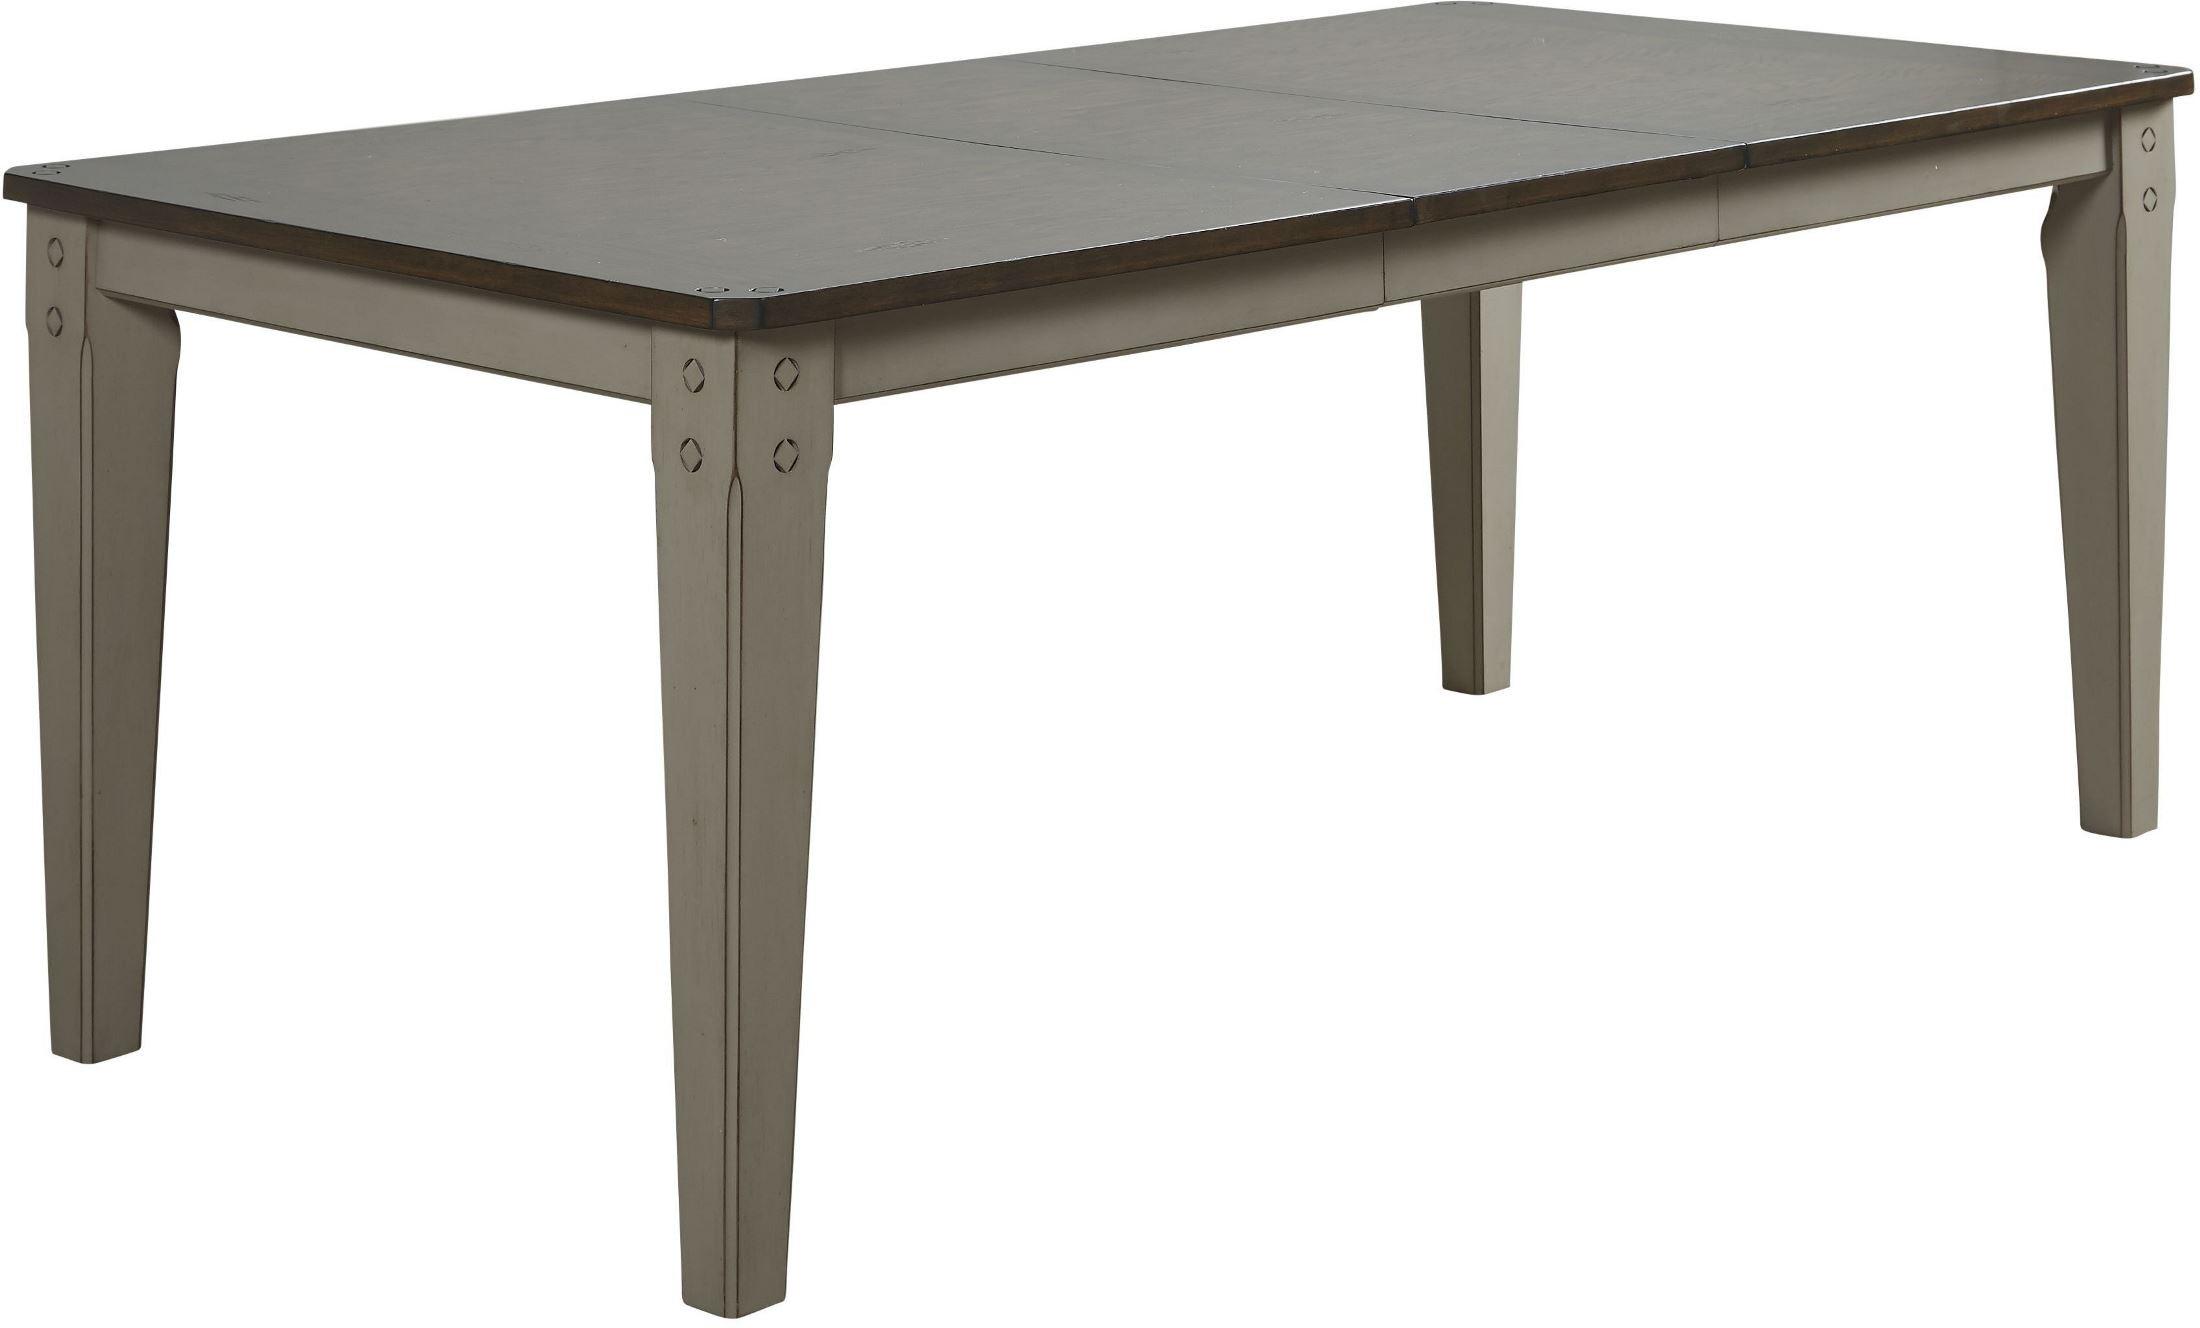 Shaker nouveau dark oak extendable rectangular dining for Dark oak dining table